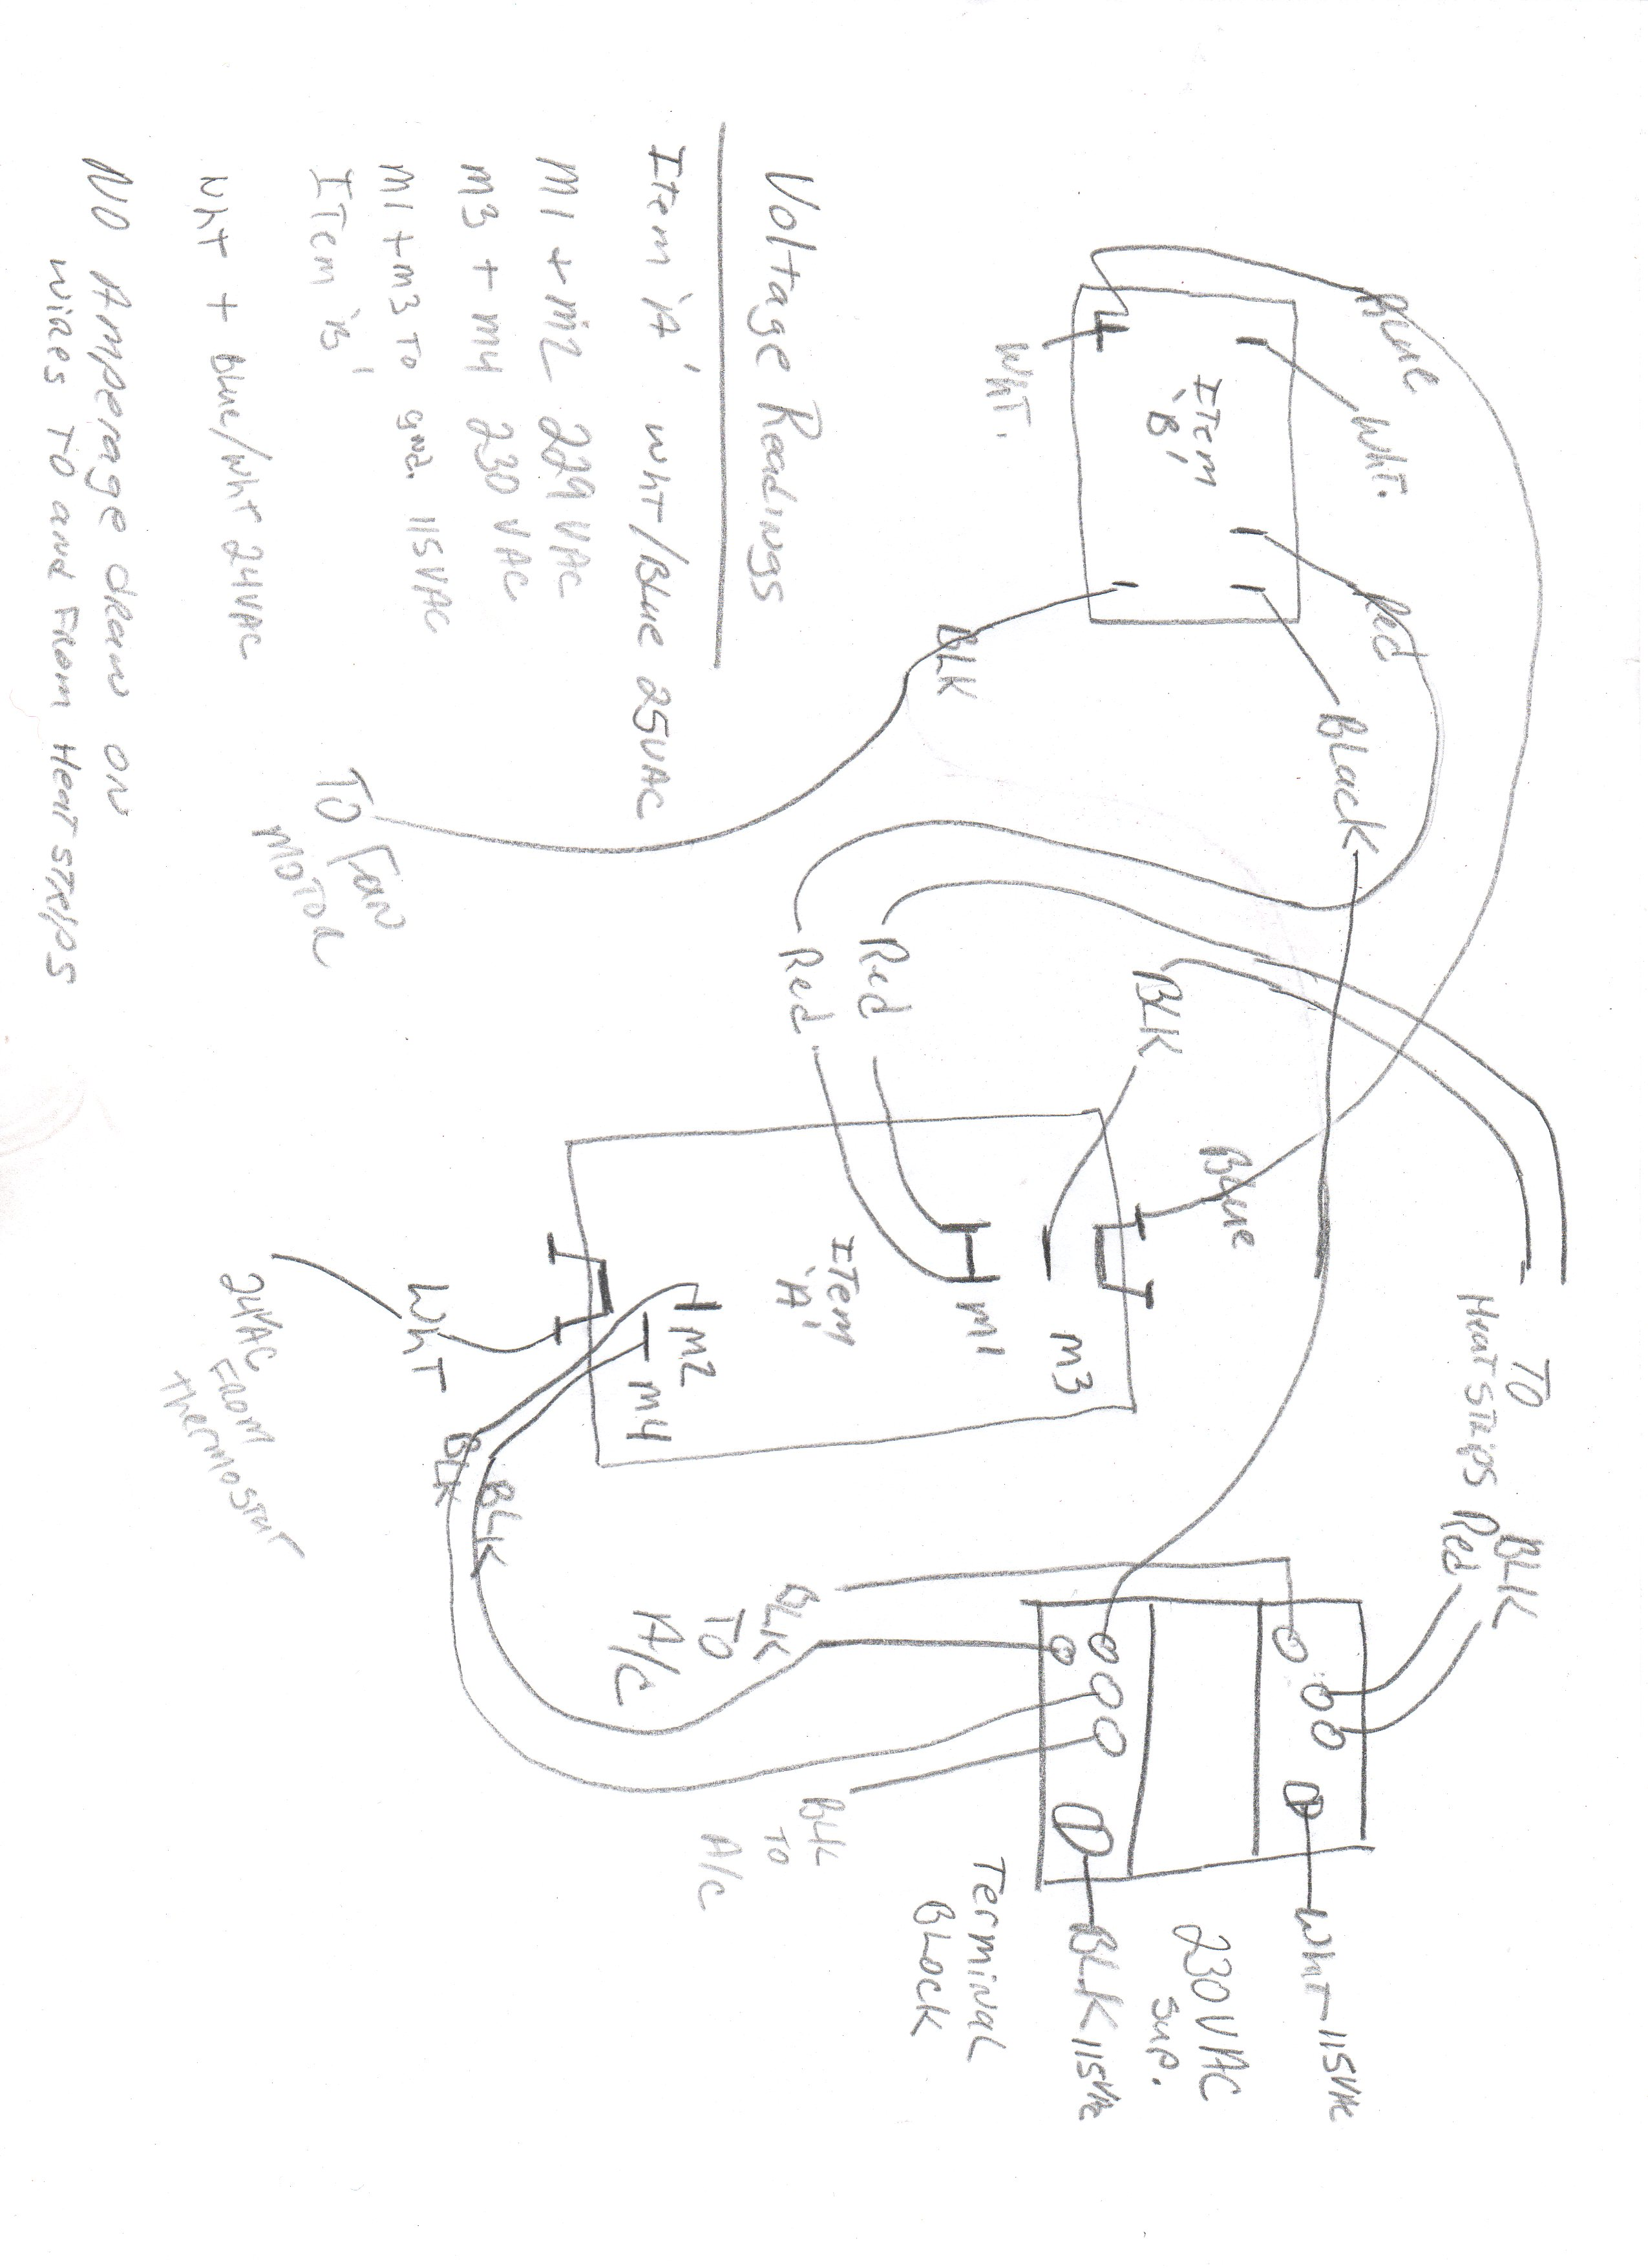 Wiring Diagram Database: Whelen Strobe Light Wiring Diagram